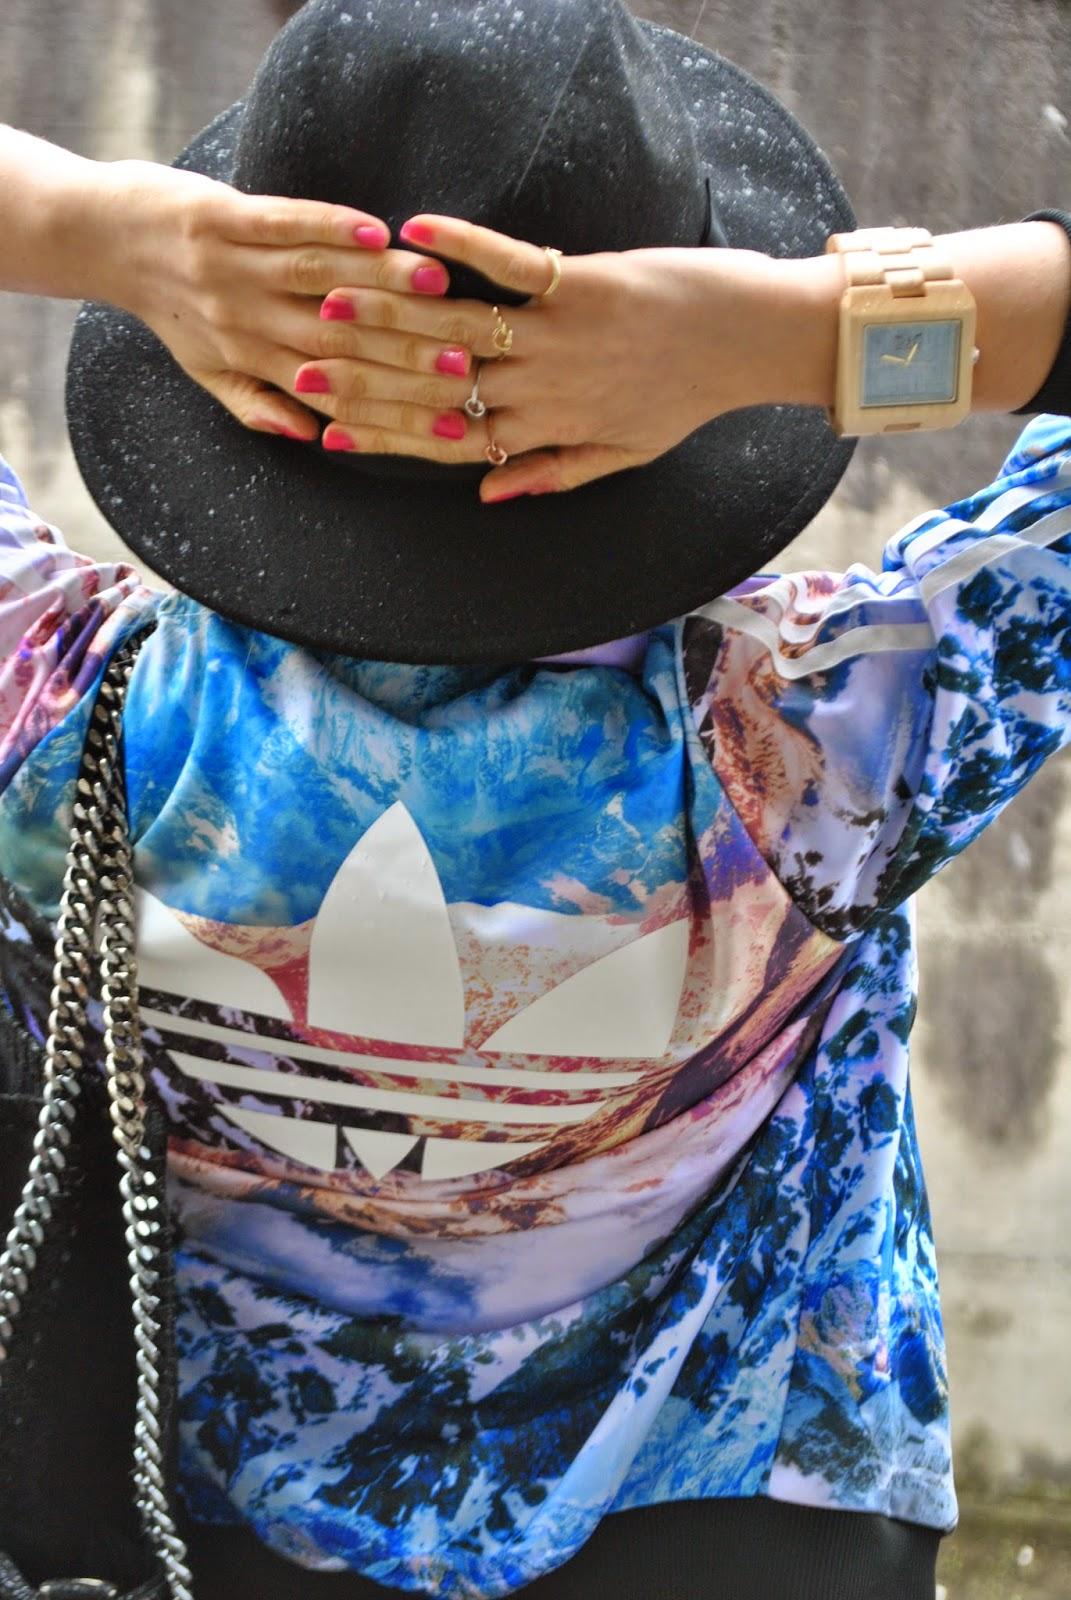 anelli majique orologio in legno gufo italy cappello fedora mariafelicia magno fashion blogger colorblock by felym come abbinare il cappello fedora abbinamenti cappello fedora outfit pioggia primaverile felpa adidas stampata outfit felpa adidas stampata con paesaggio felpa adidas outfit jeans e felpa outfit jeans e tacchi mariafelicia magno colorblock by felym mariafelicia magno fashion blogger outfit jeans e tacchi outfit aprile 2015 ragazze bionde outfit cappello fedora fedora hat adidas sweatshirt jeans and heels spring outfit outfit primaverili fashion blogger italiane fashion blog italiani blog di moda blogger di moda blondie blonde hair braid orologio in legno gufo italy falabella borsa nera outfit borsa nera outfit decollete nere